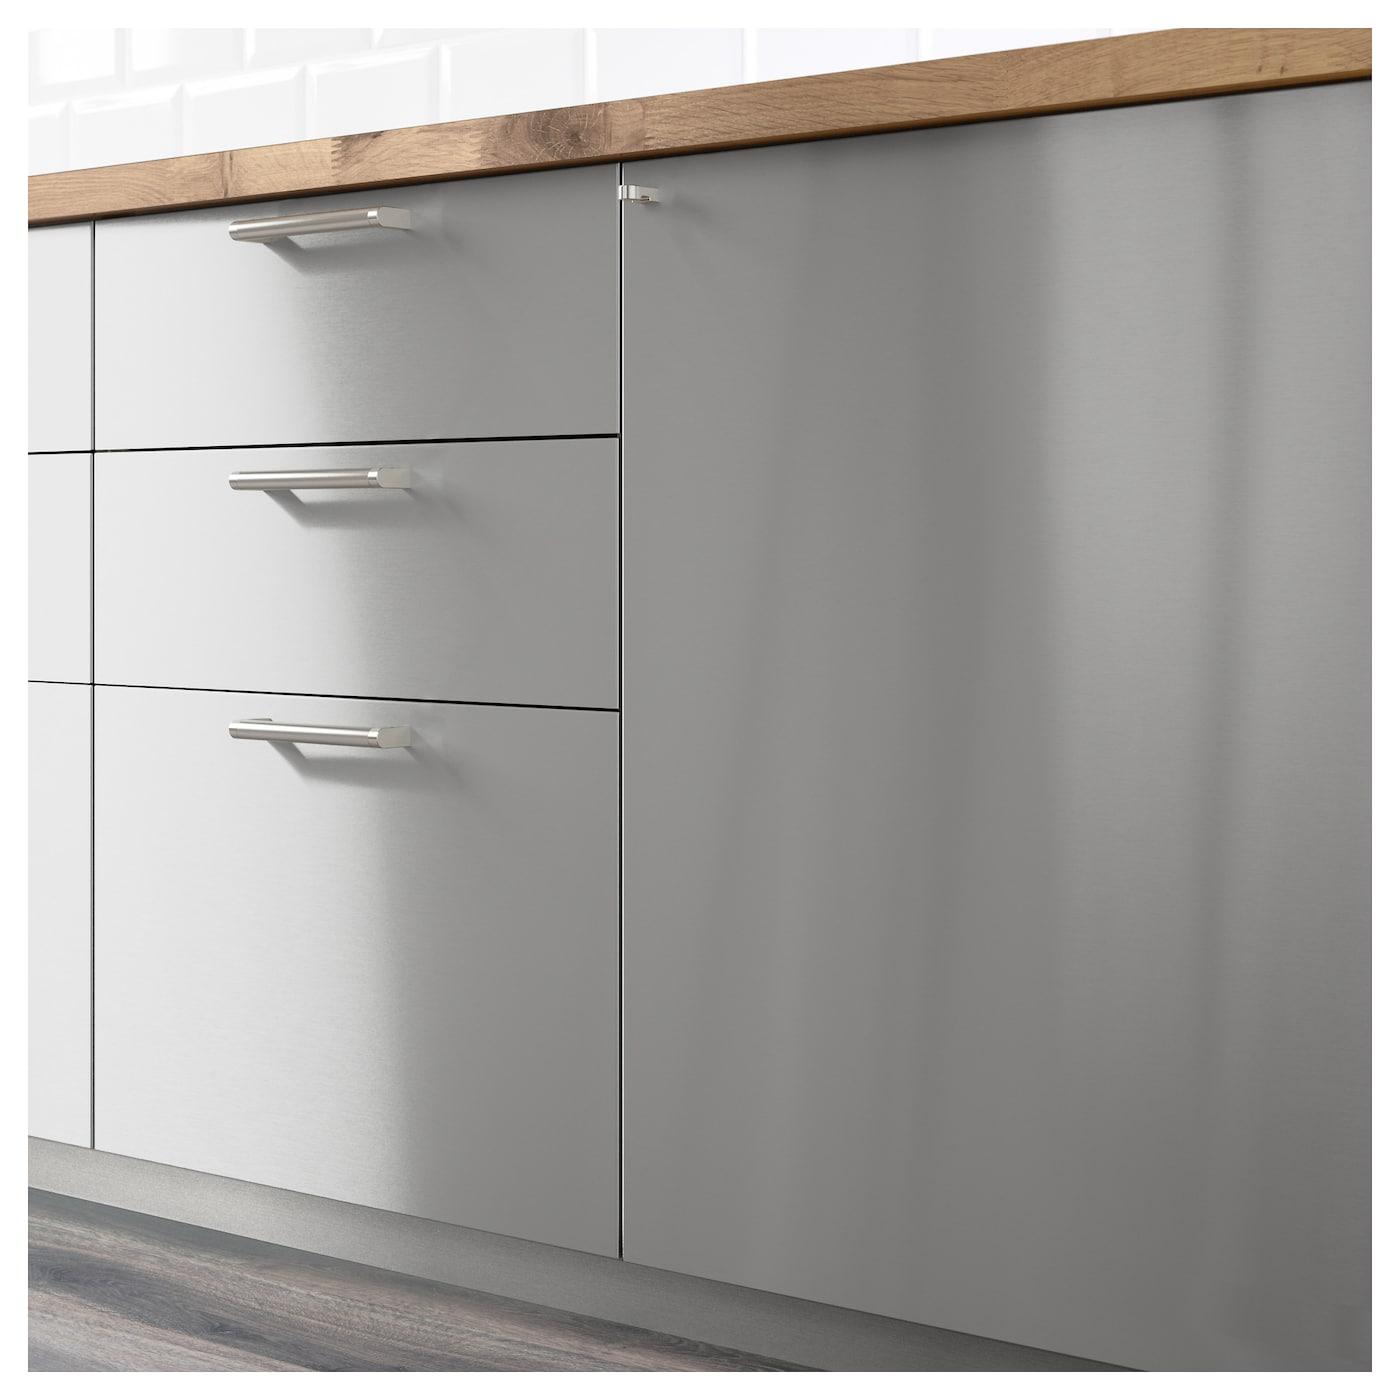 Ikea Grevsta Door 25 Year Guarantee Read About The Terms In Brochure